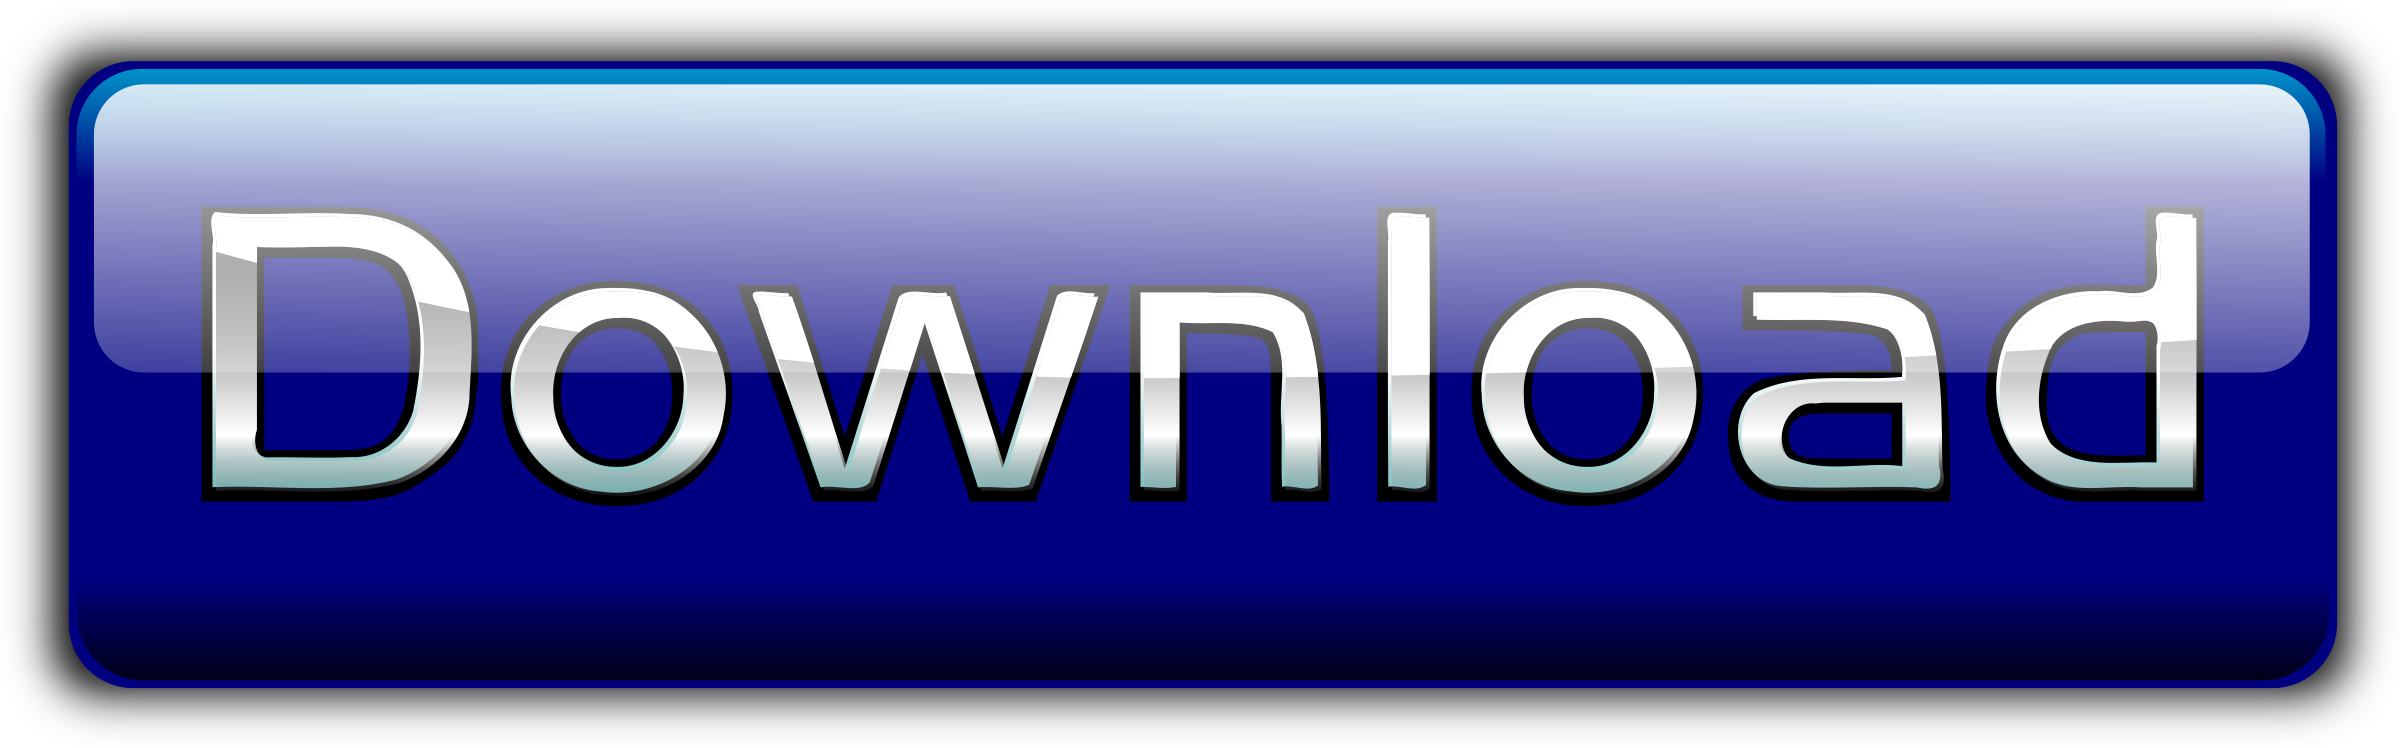 Download-2.png?width=300